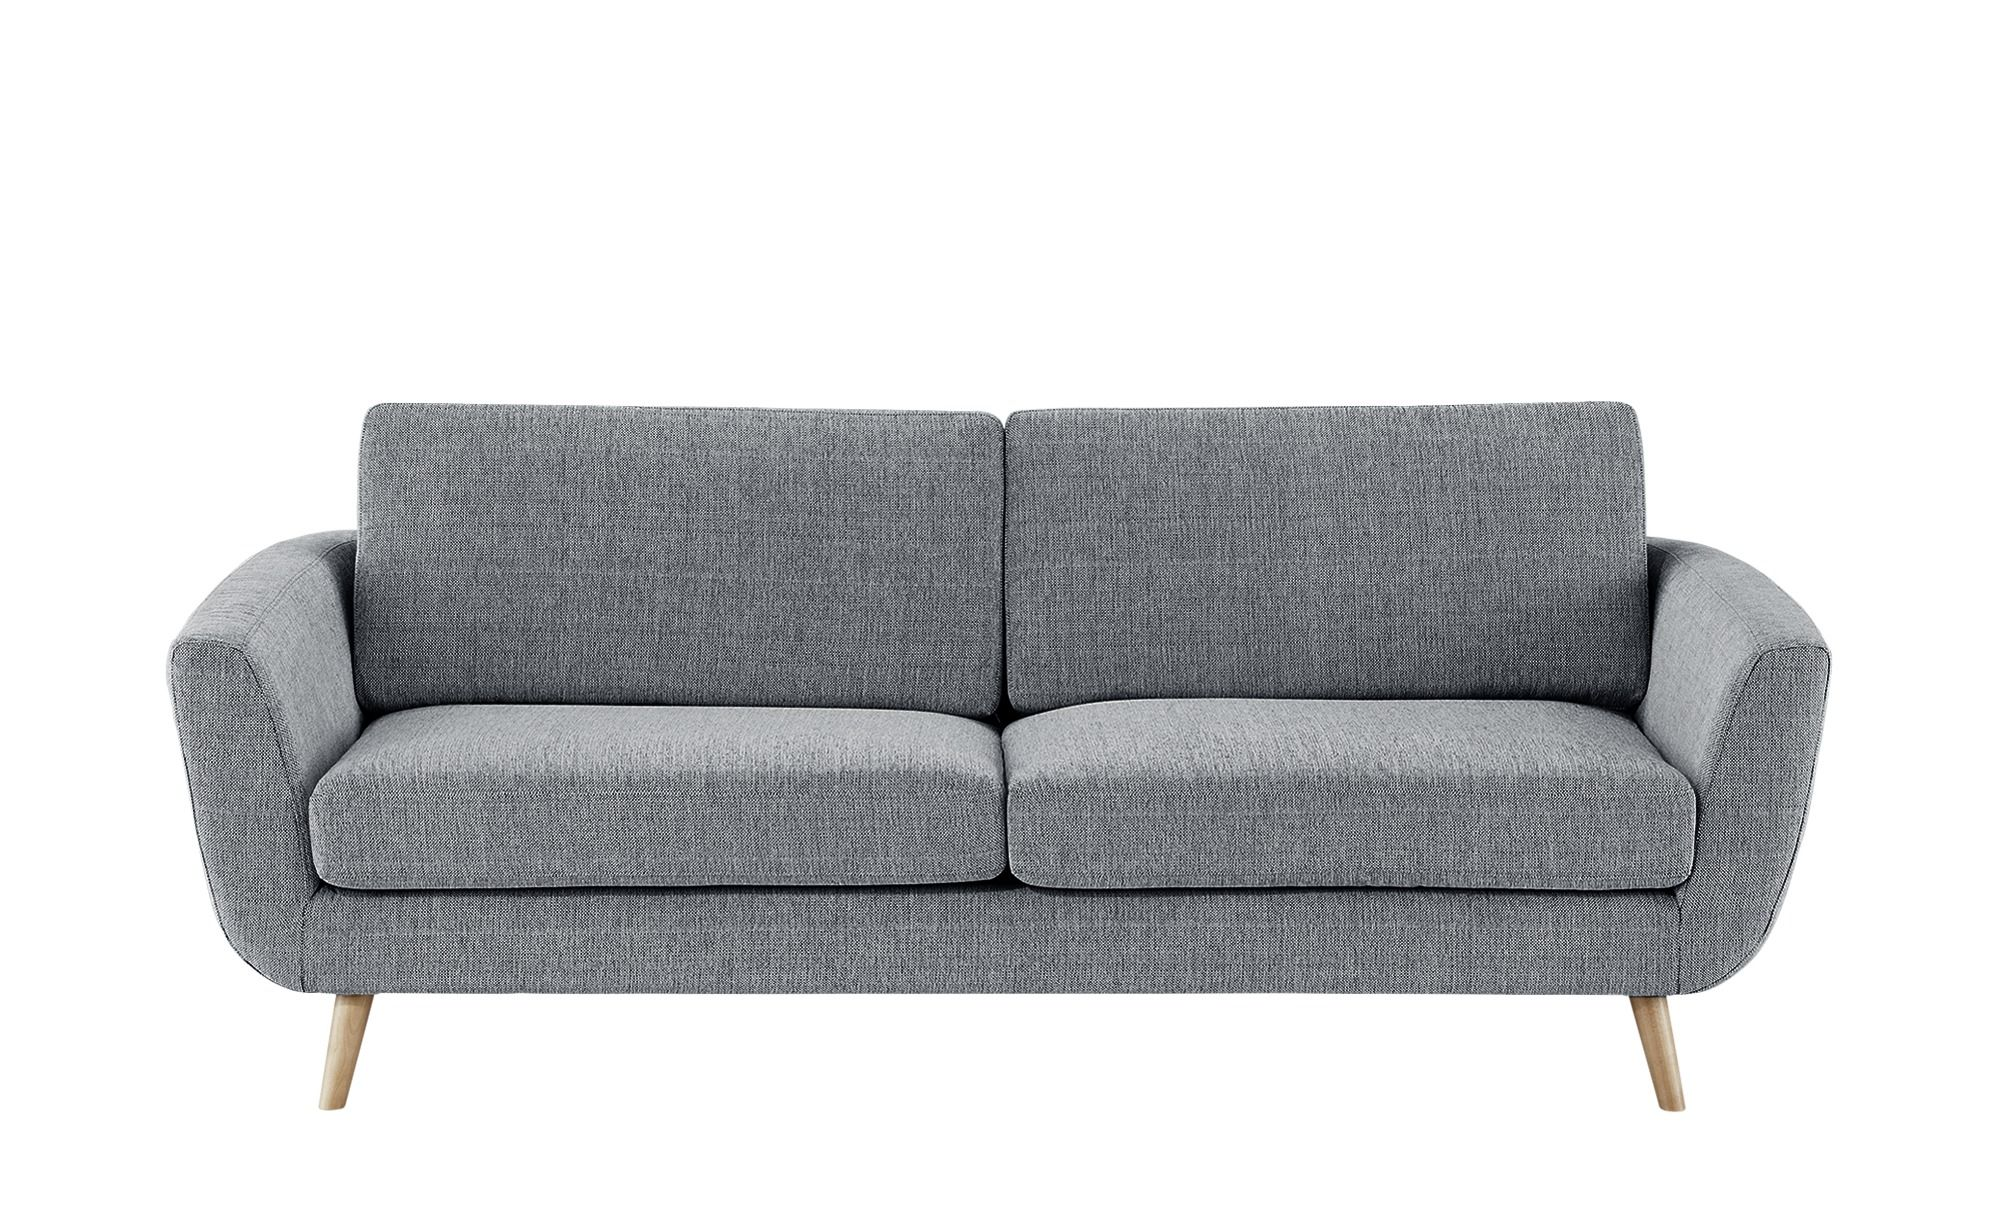 Soho Sofa Smilla Gefunden Bei Mobel Hoffner Mit Bildern Sofa Big Sofa Kaufen Braunes Sofa